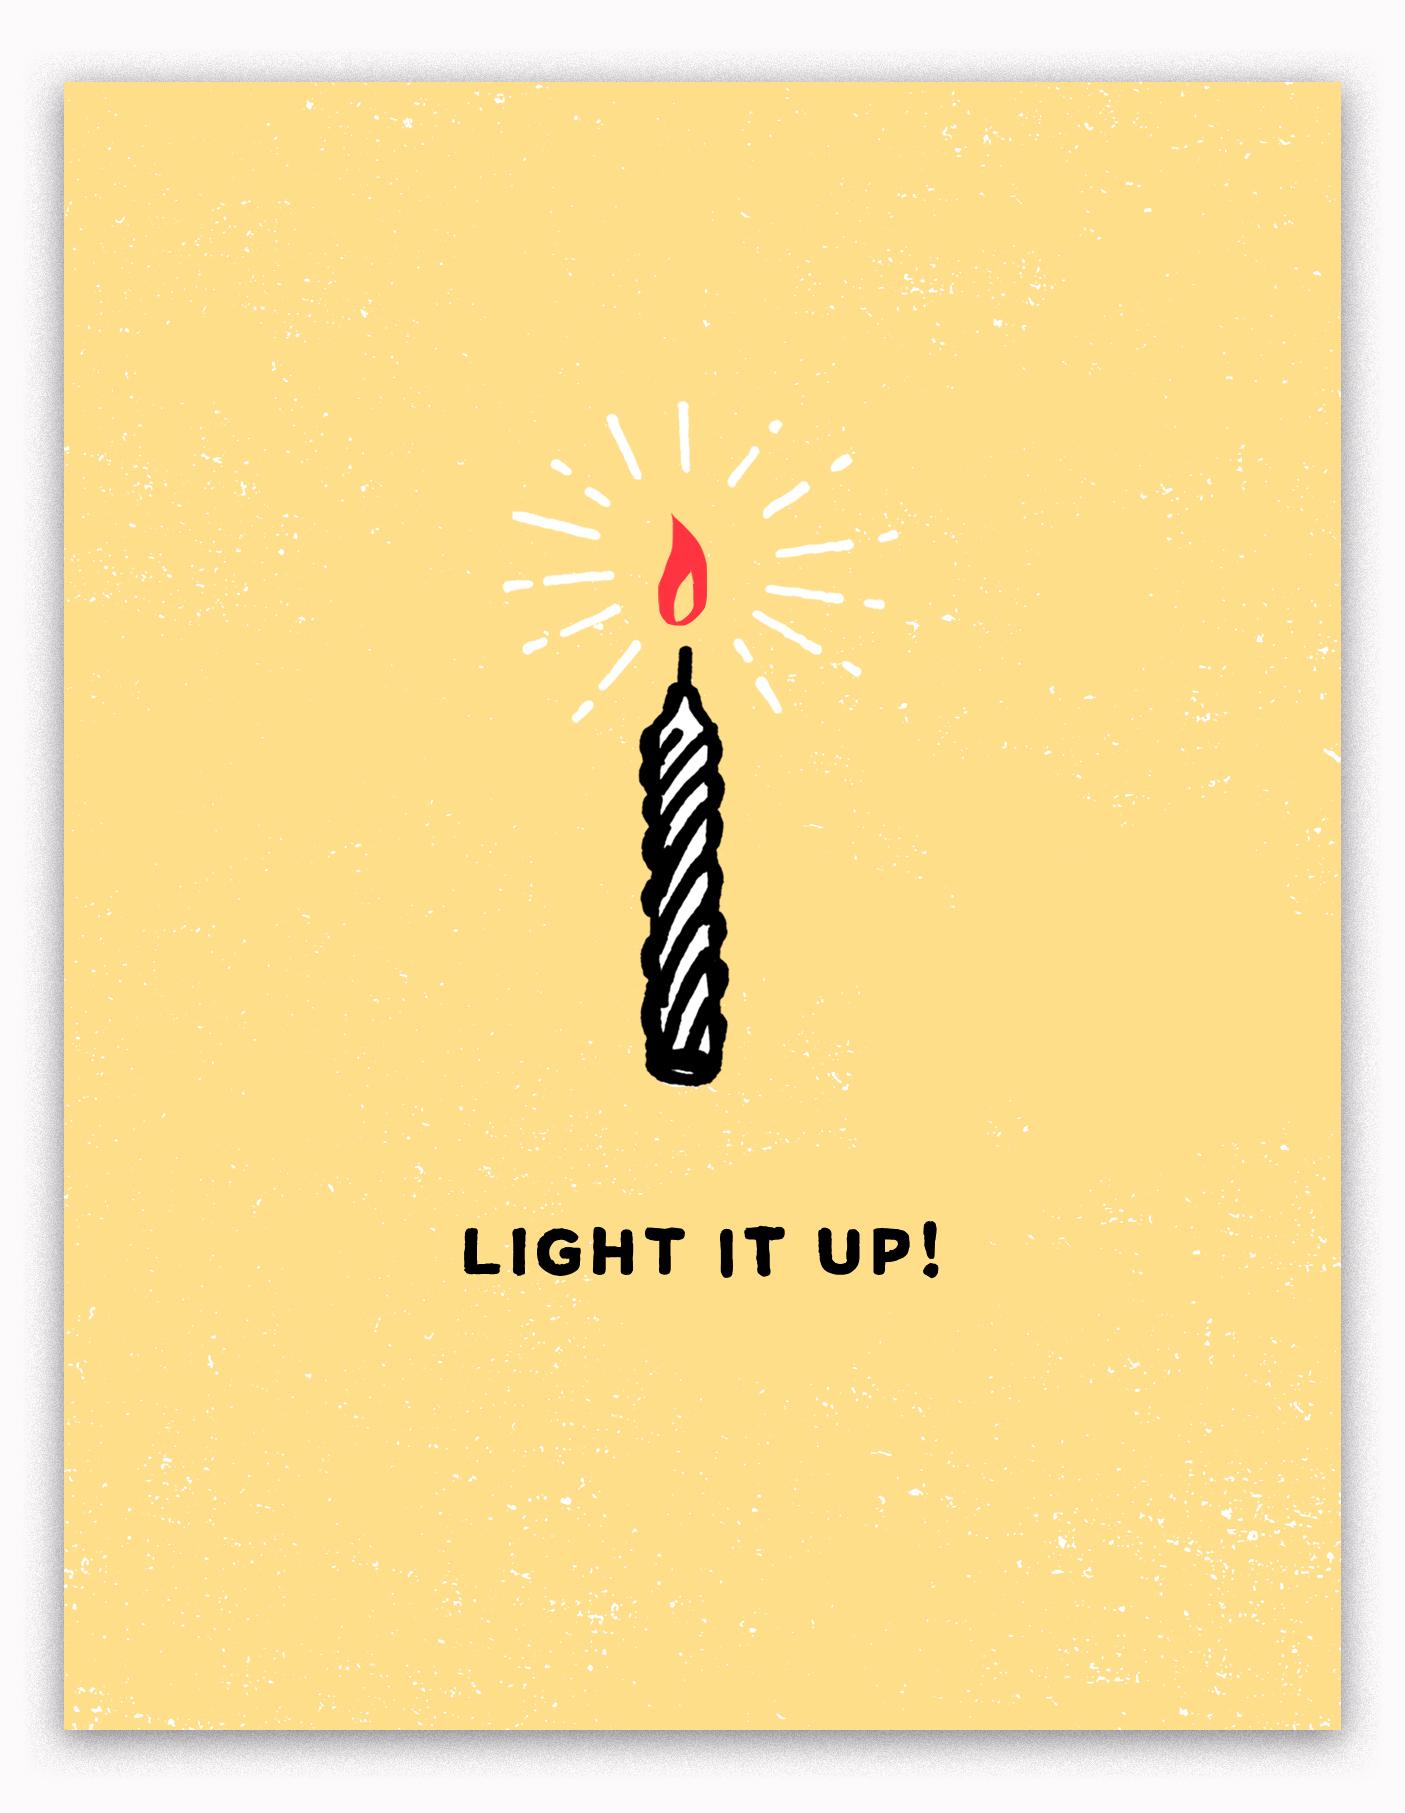 2b.candle.light it up.jpg